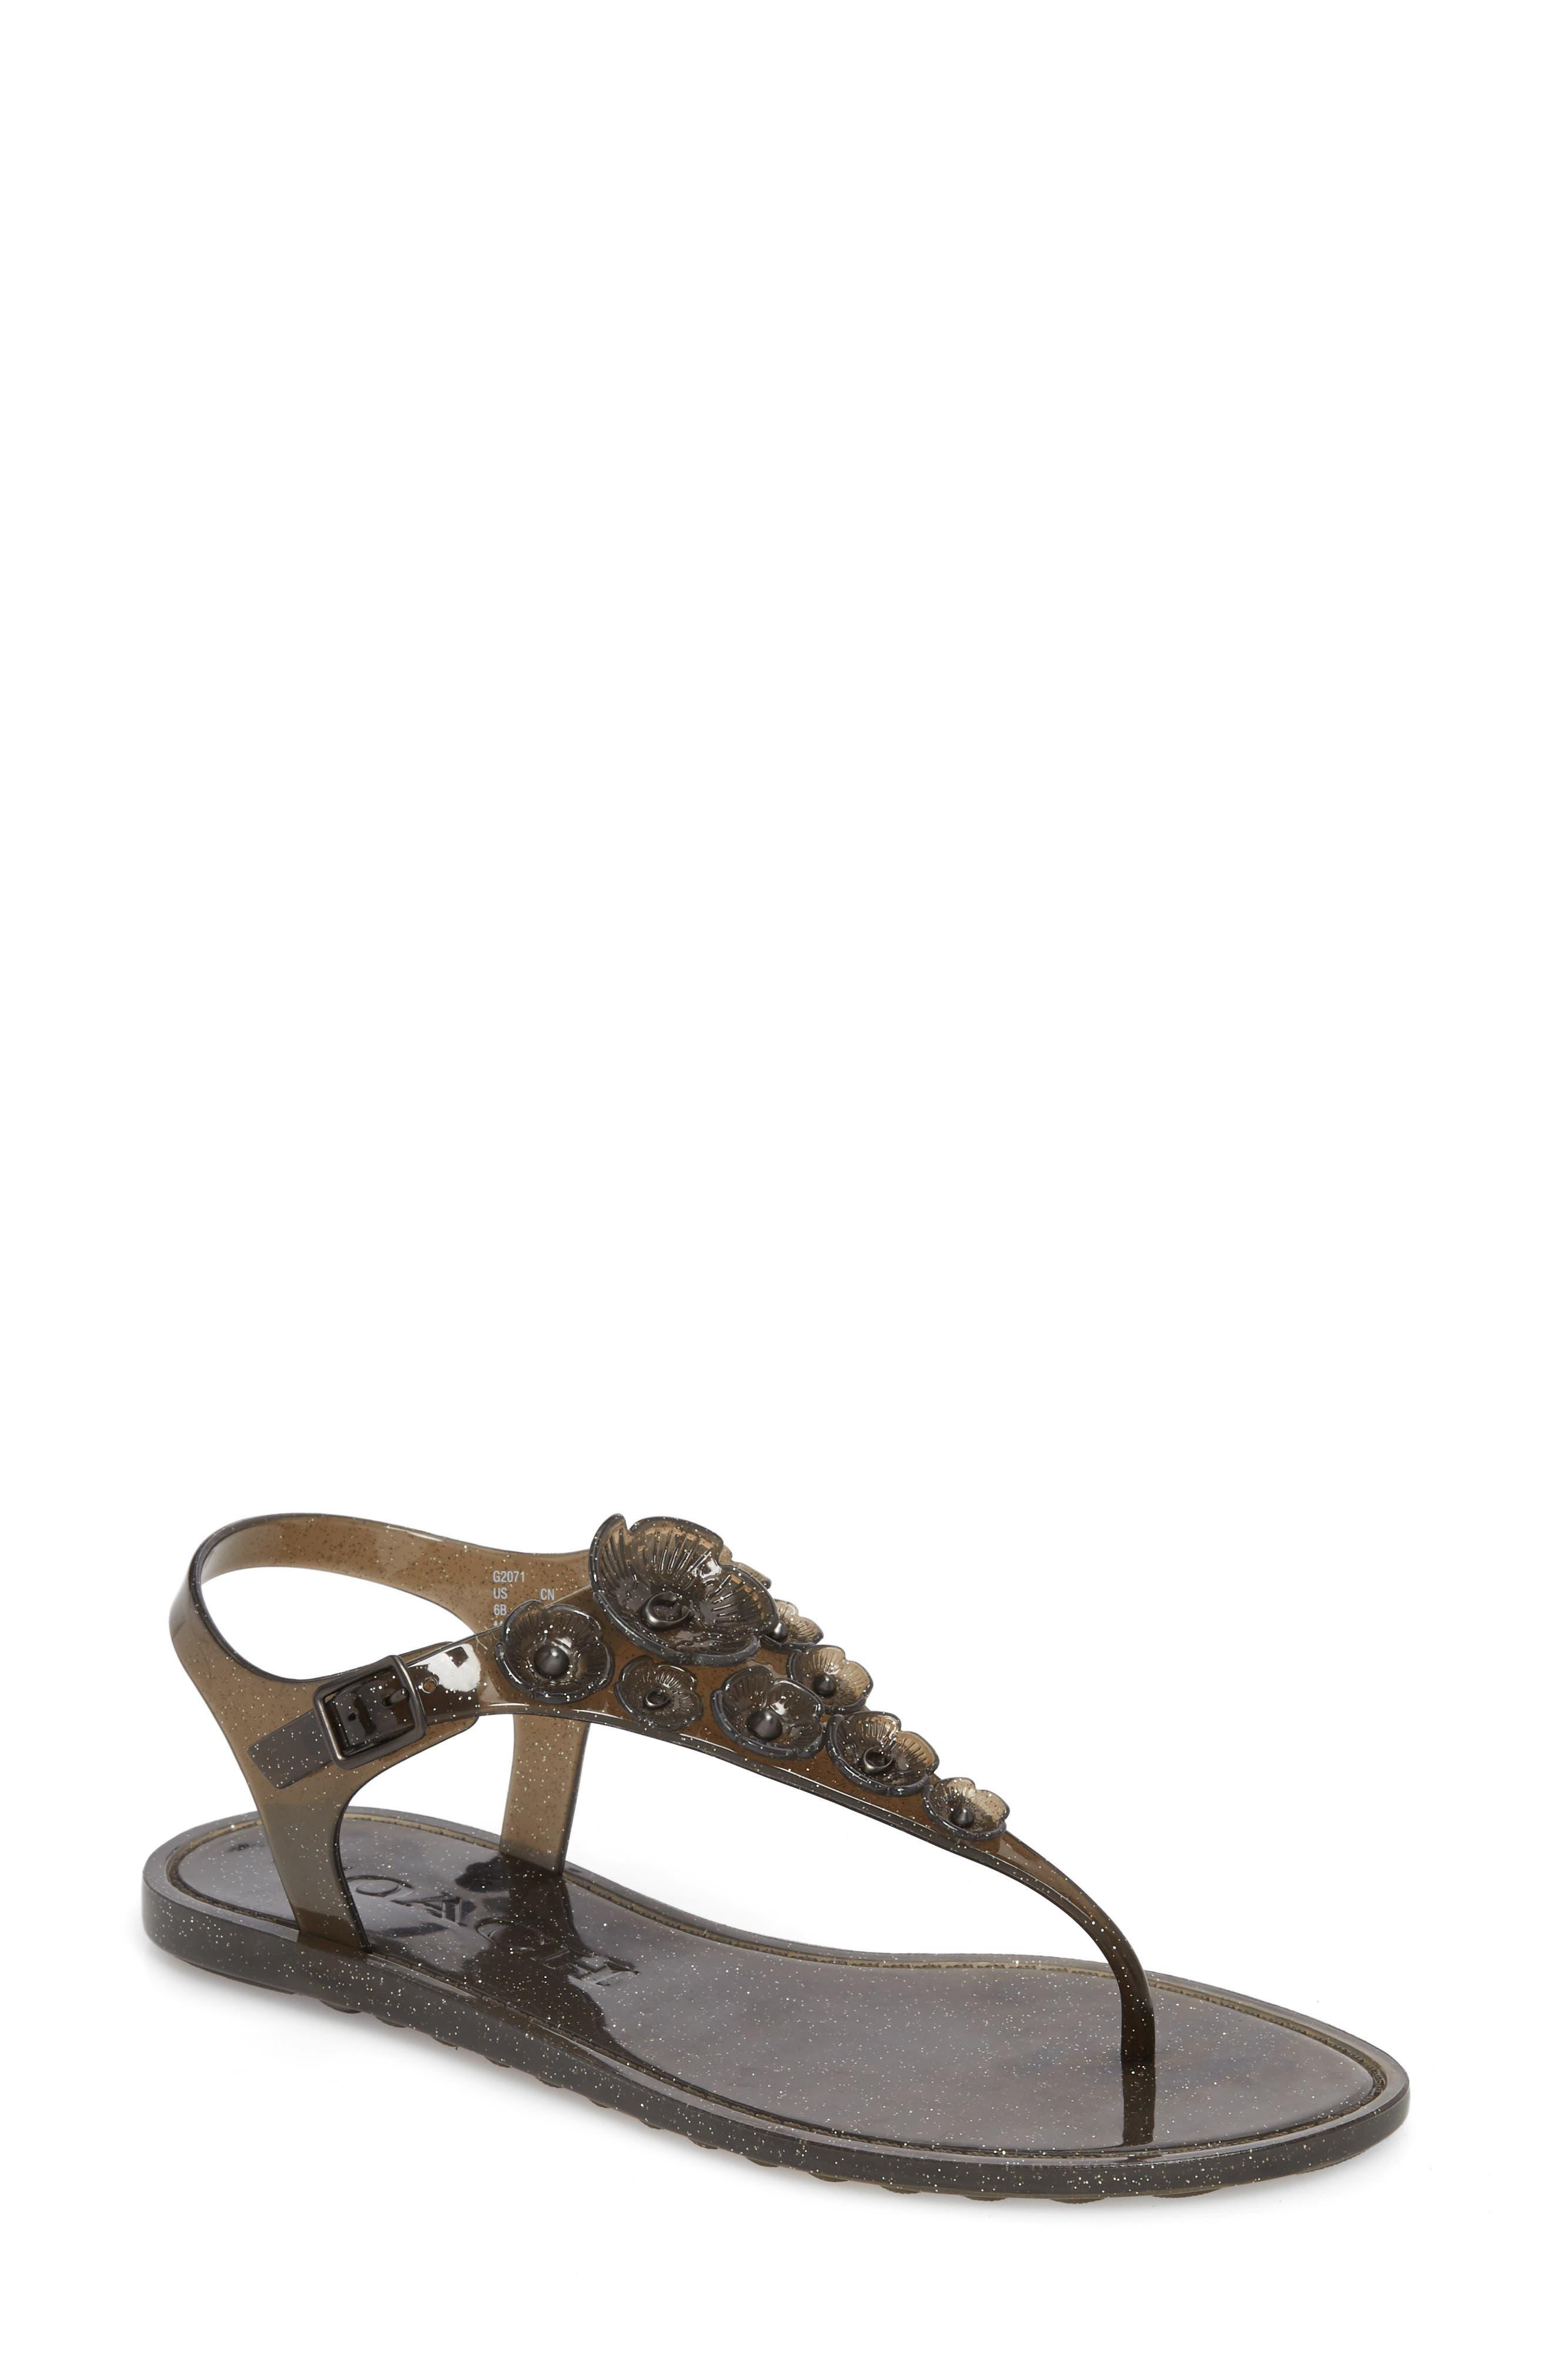 Tea Rose Sandal,                         Main,                         color, Black Glitter Jelly